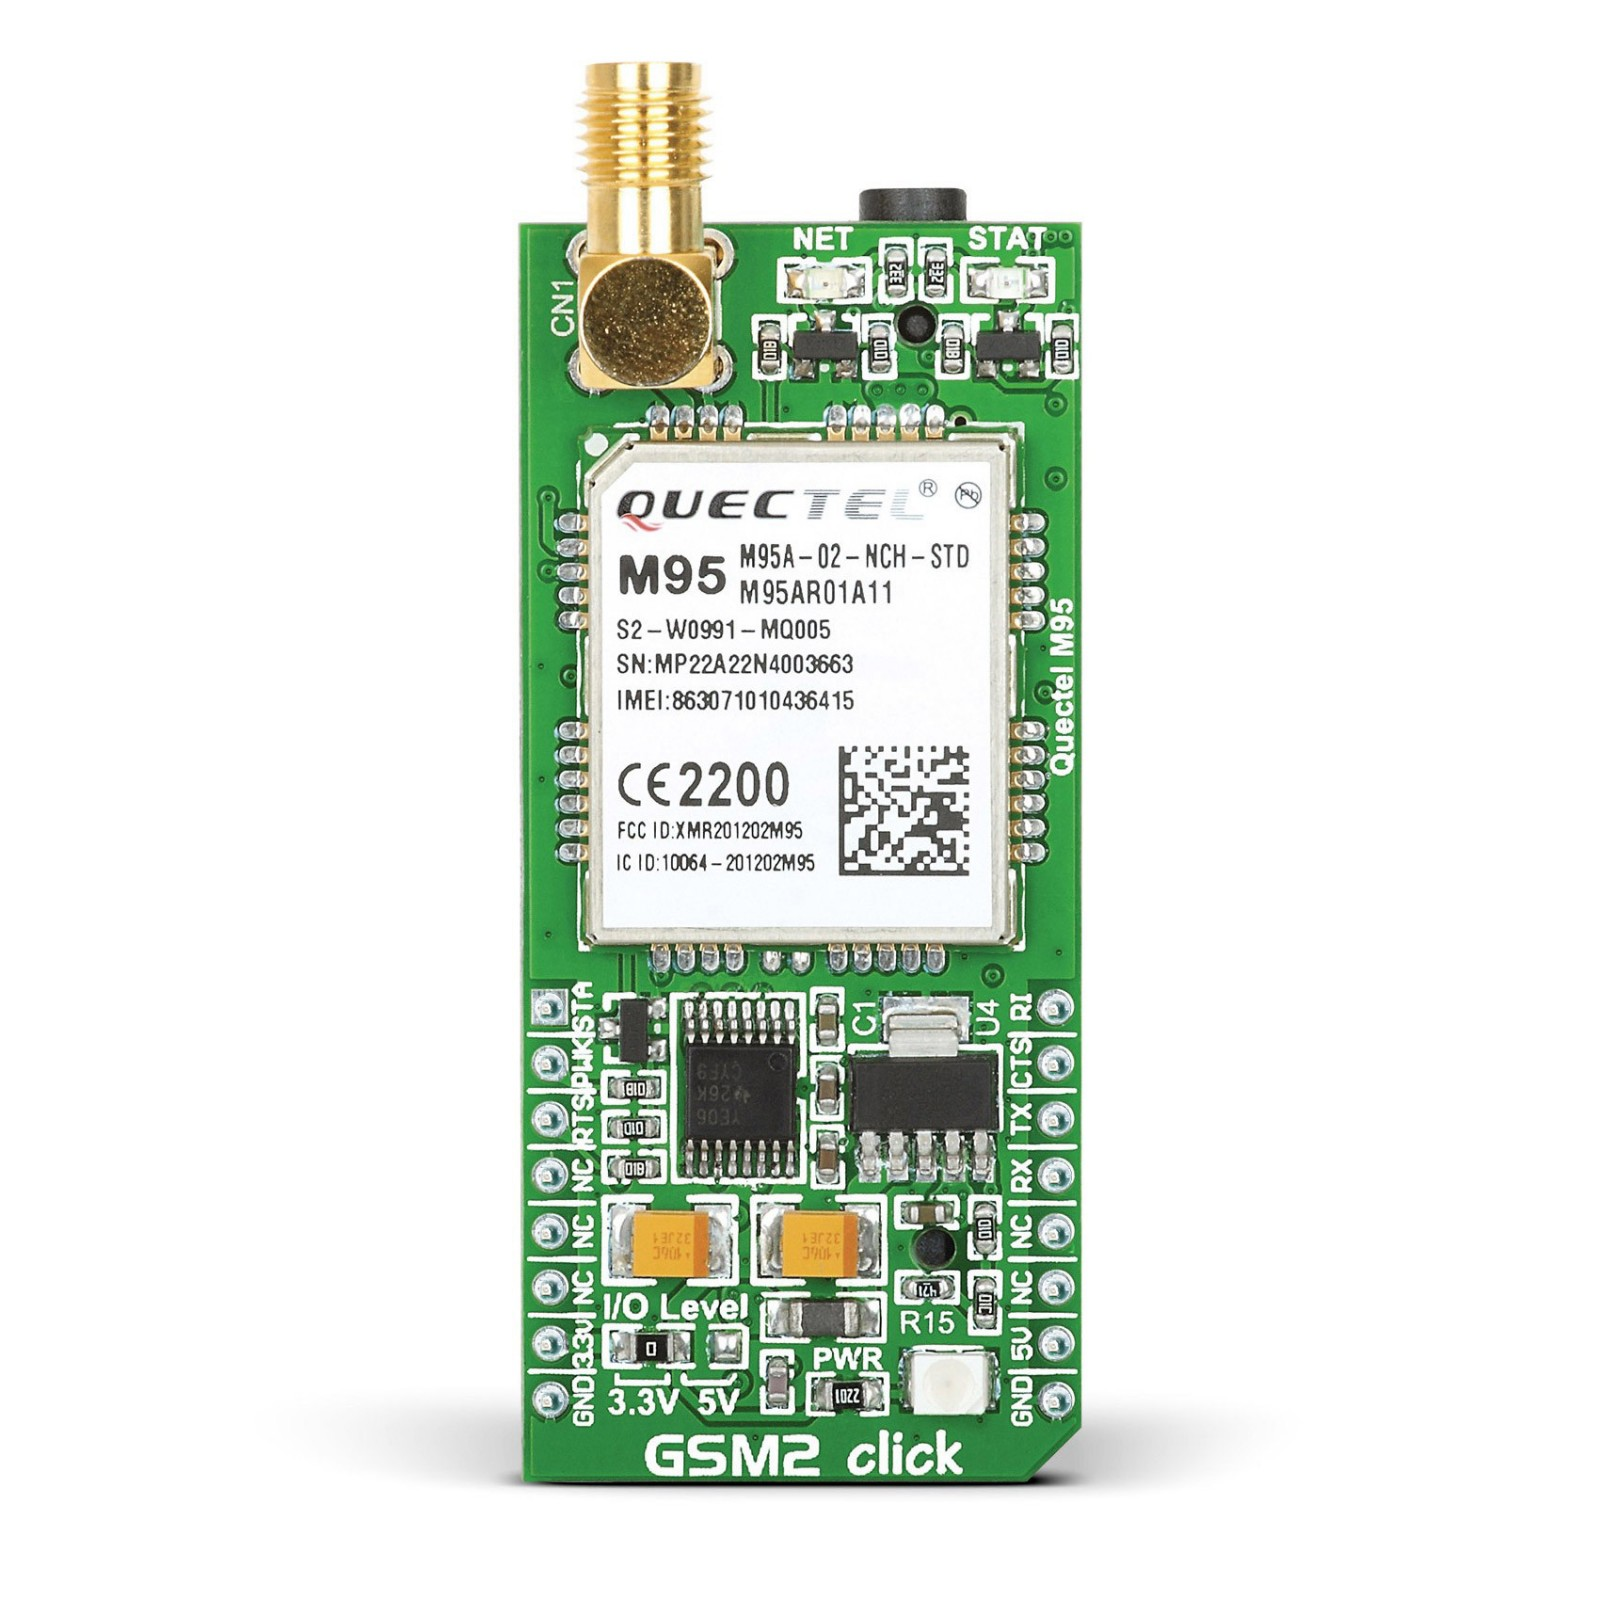 GSM2 Click Board - MikroElektronika